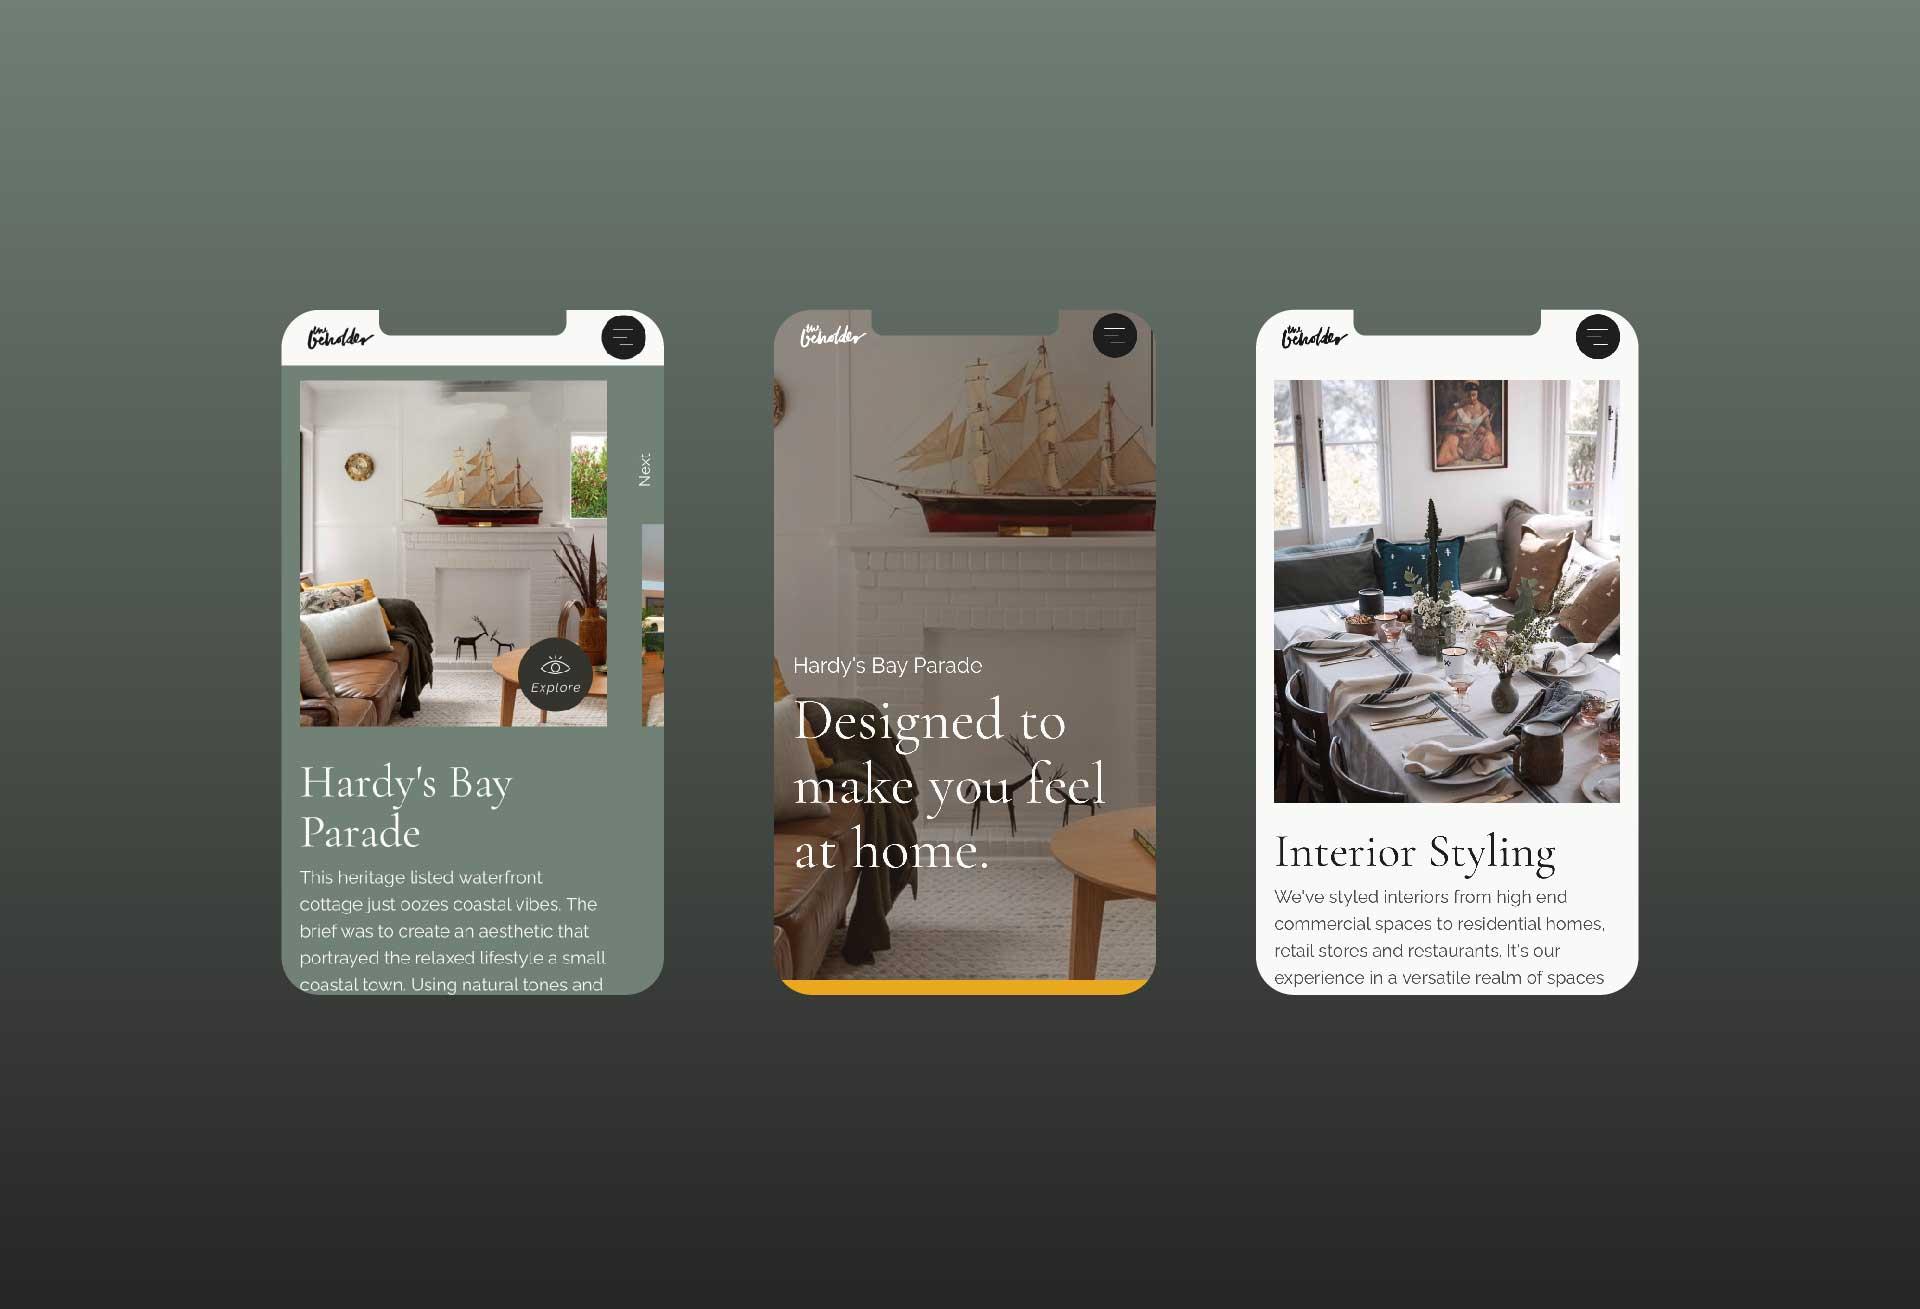 Mobile optimised website design for The Beholder Styling + Design